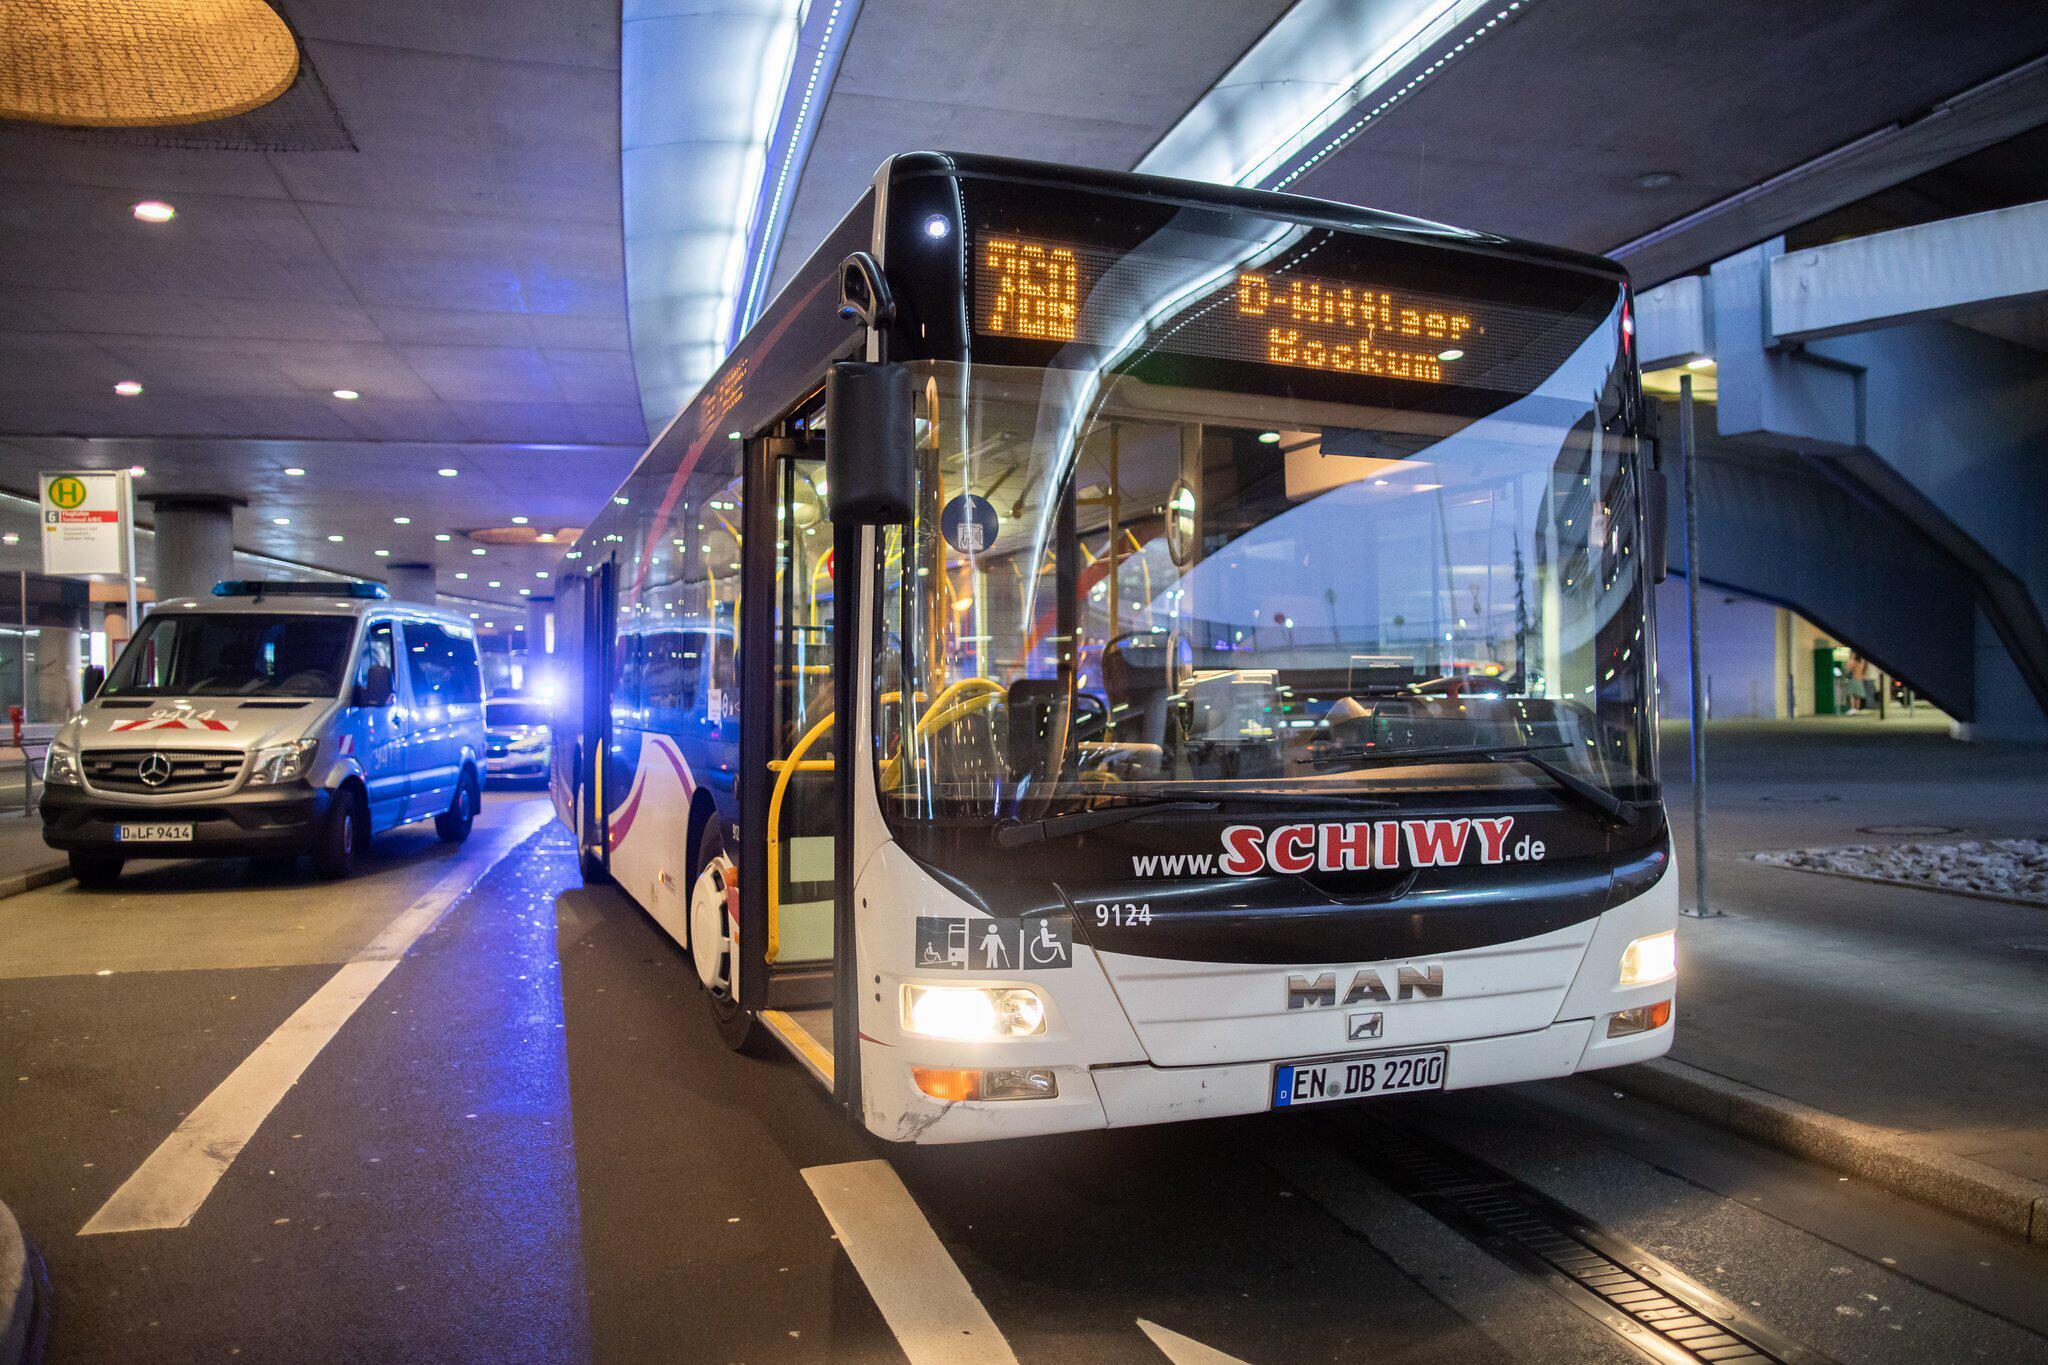 Bild zu Knife stabbing in a bus at Duesseldorf airport